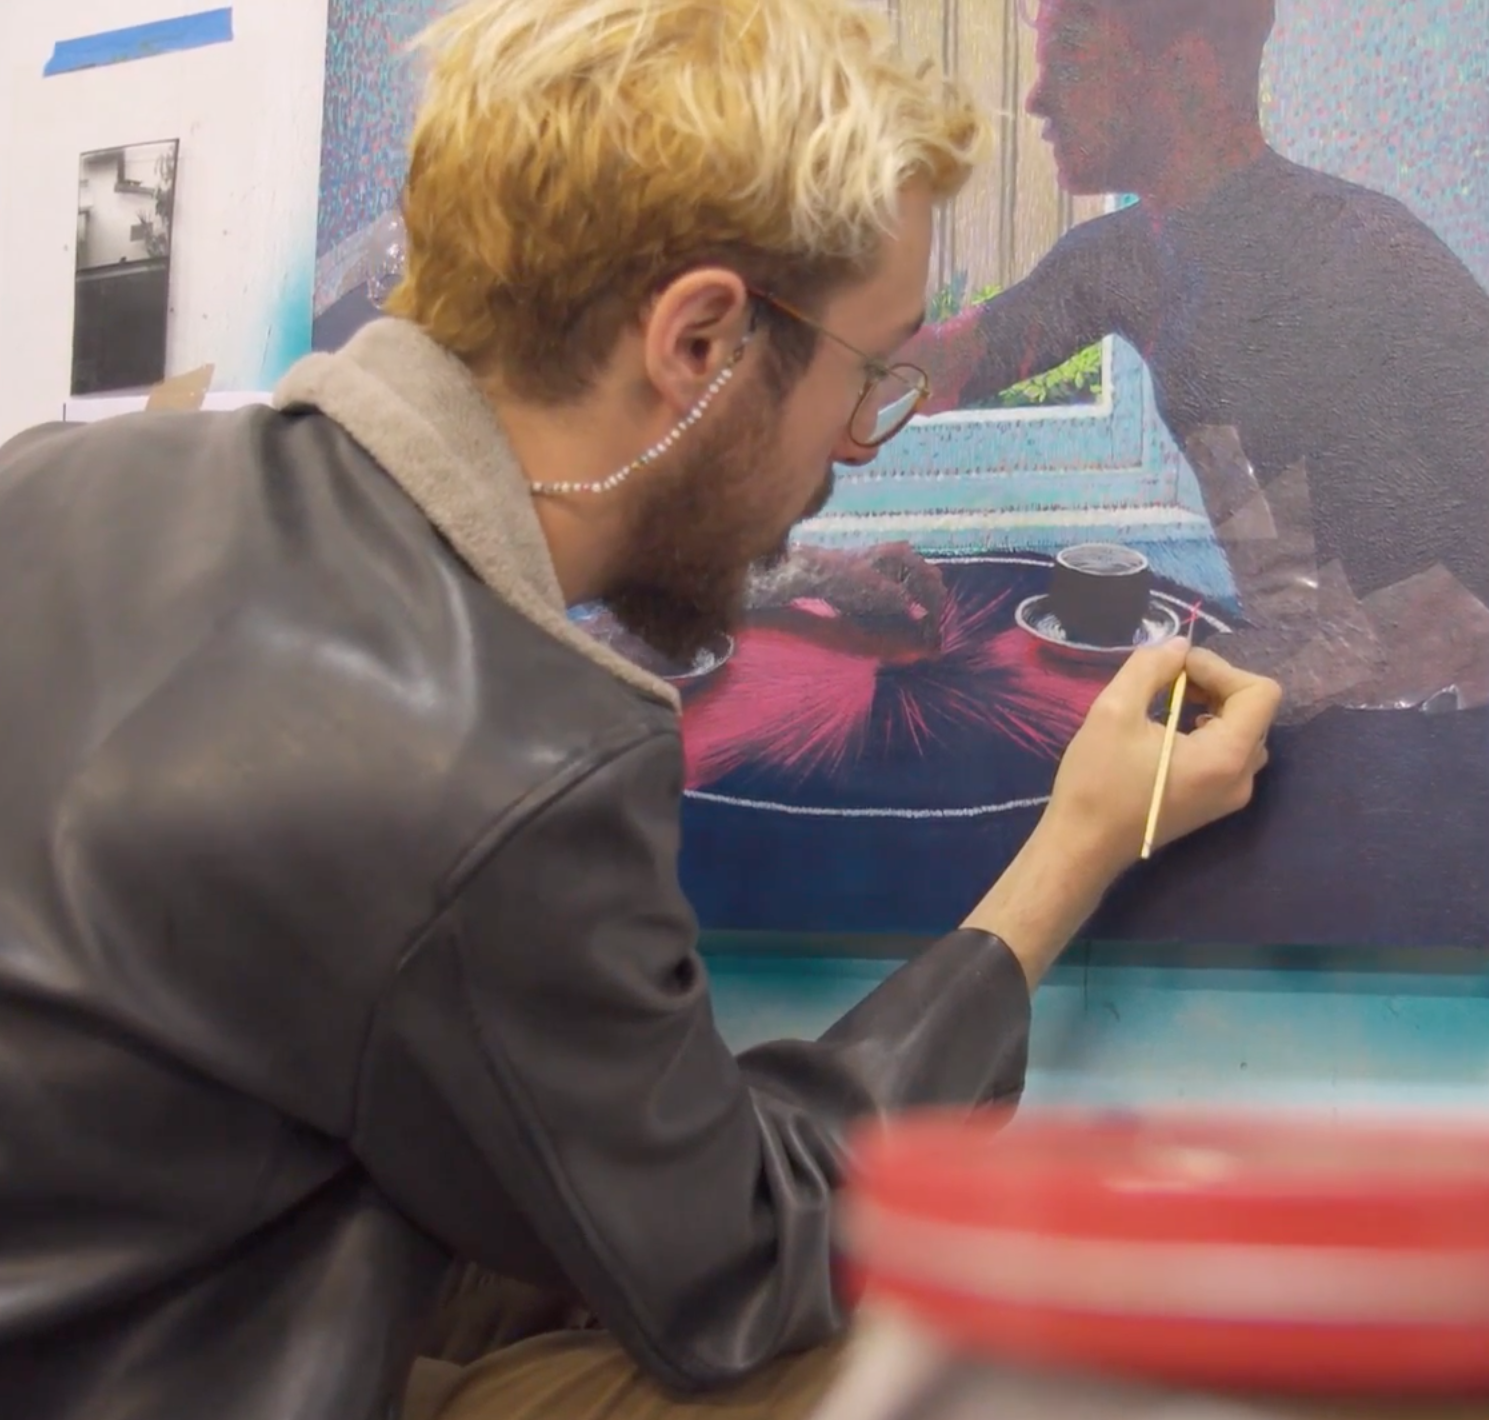 Tom Ferson, artist